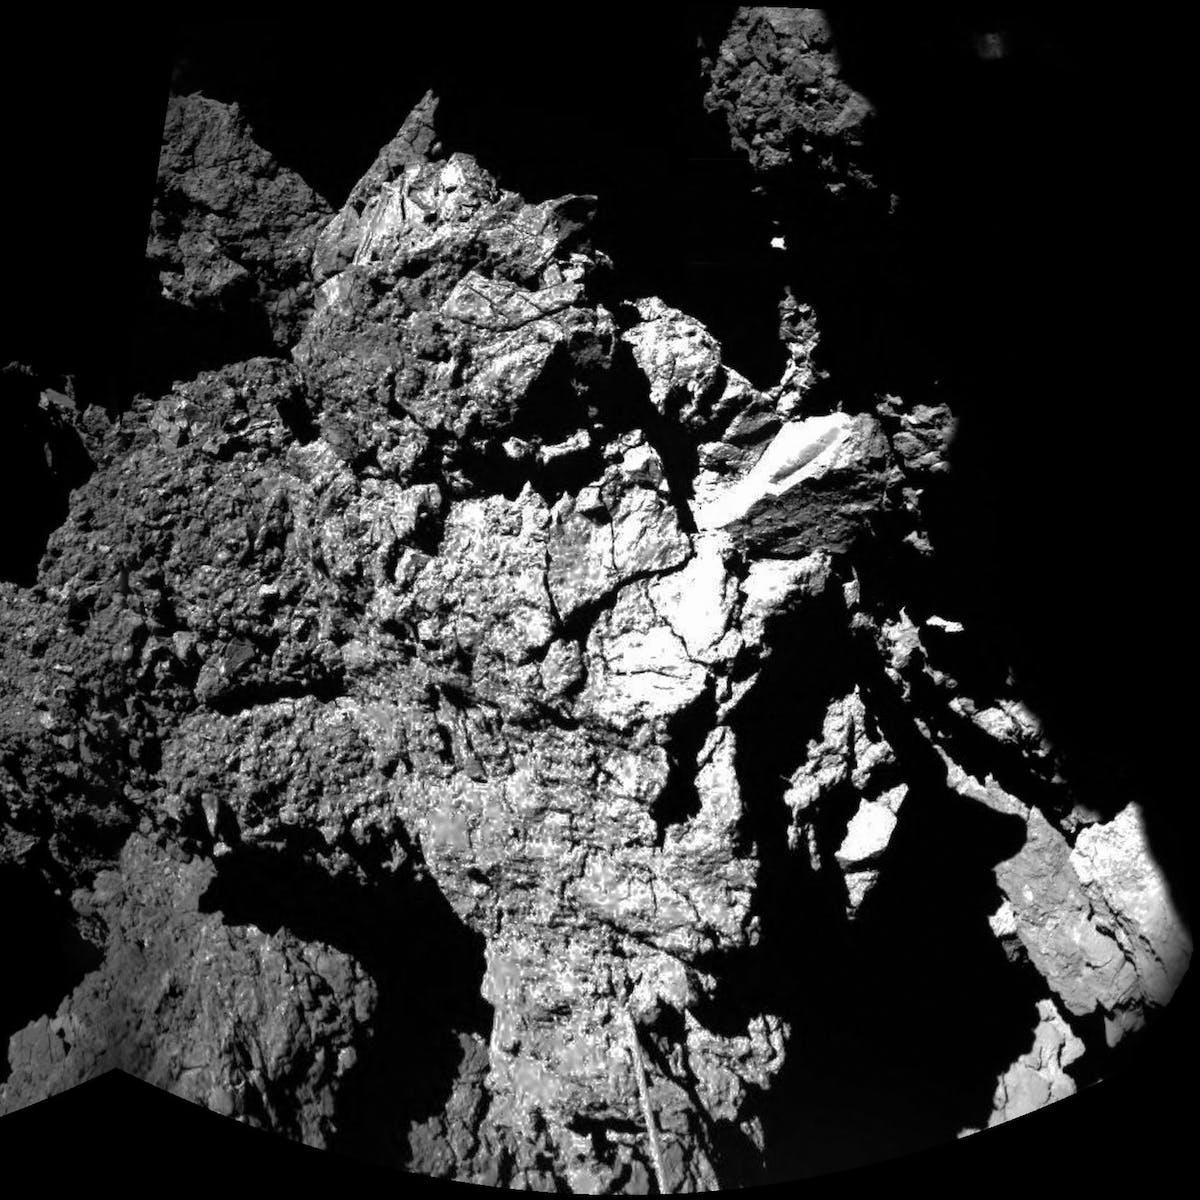 Rosetta Completes Historic Comet Landing, Ending ESA Mission